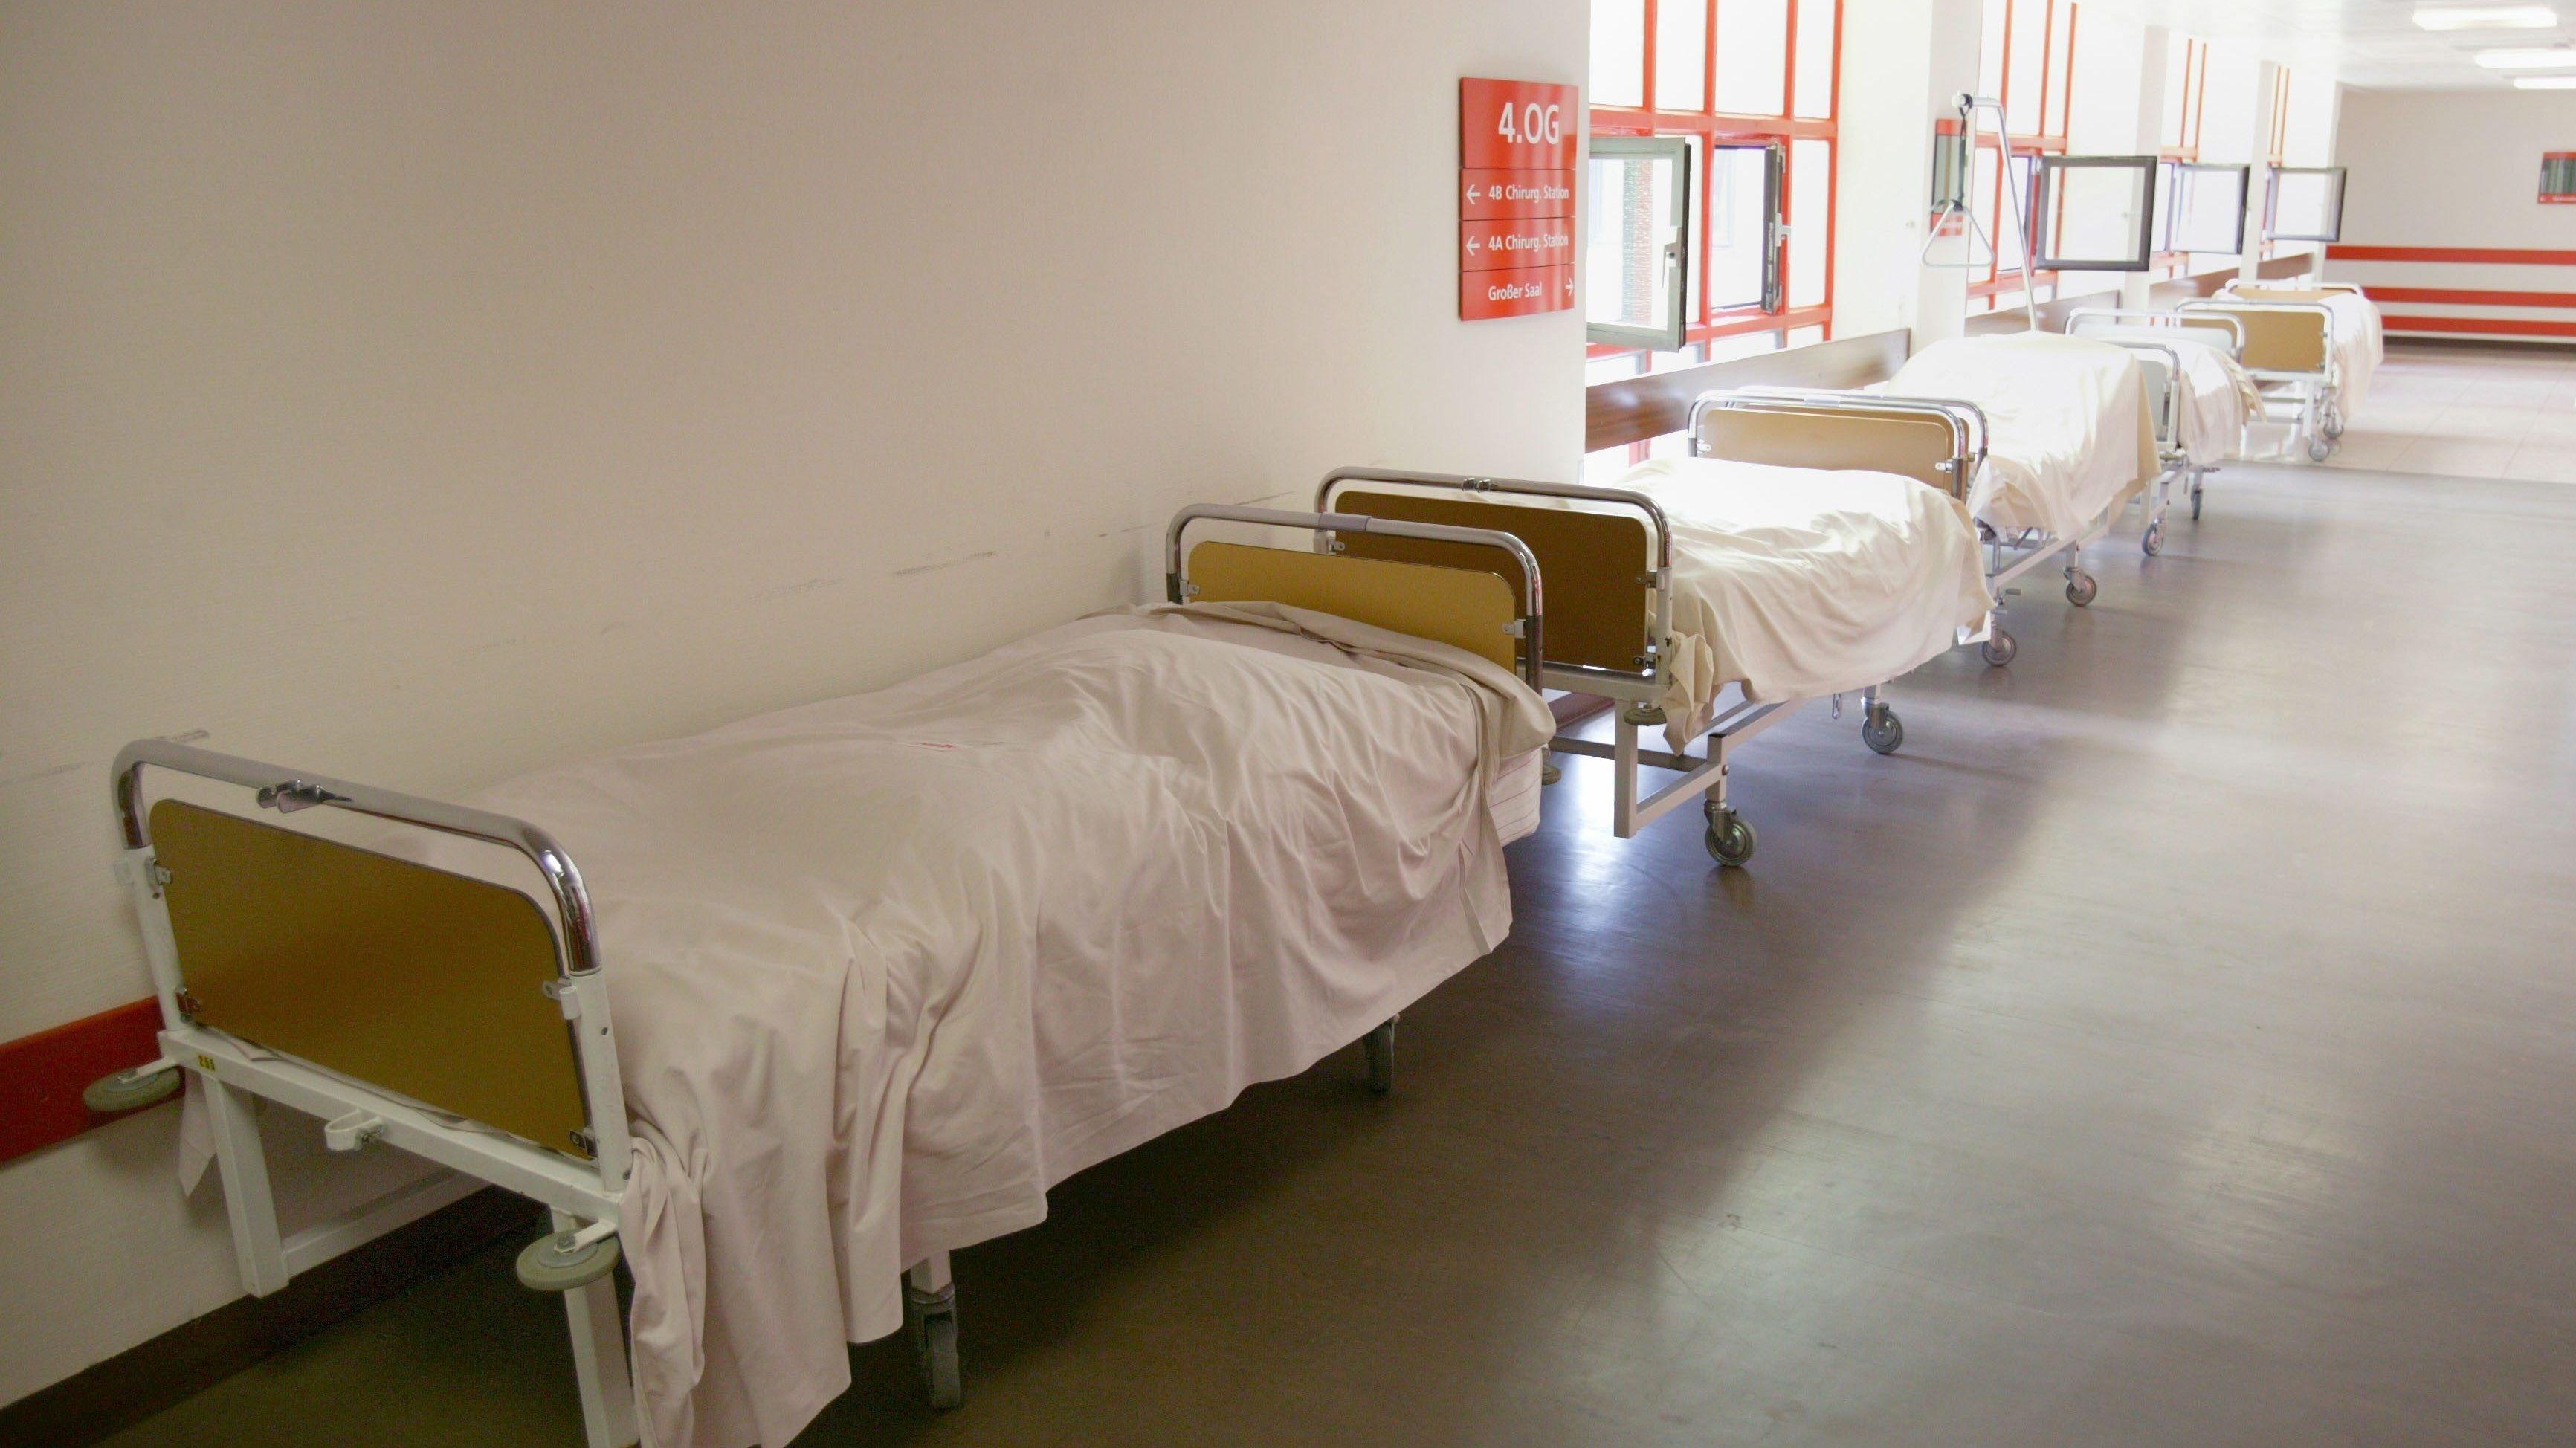 Leere Krankenhausbetten im Flur